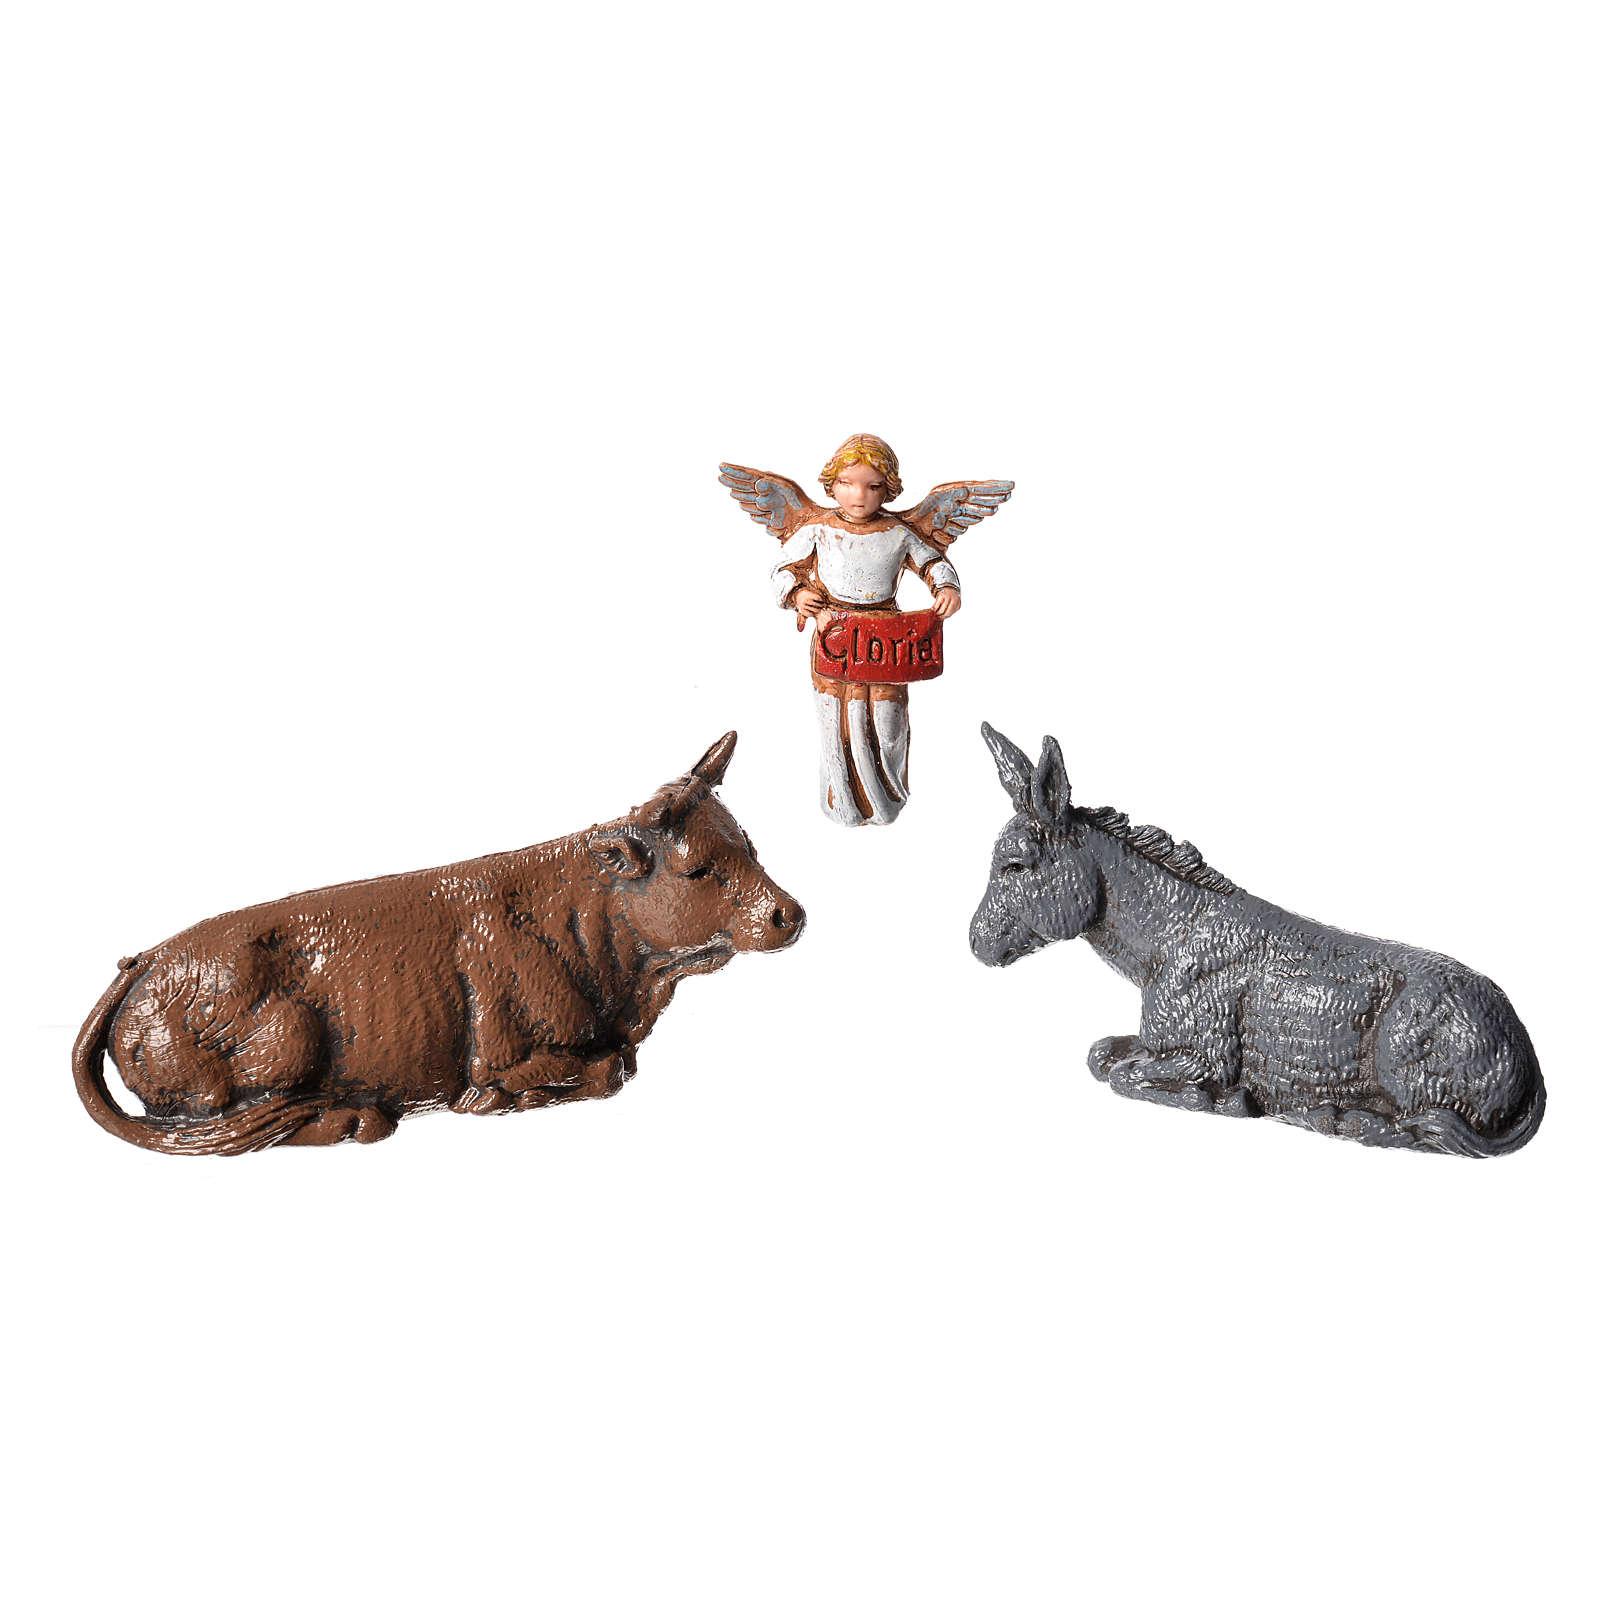 Nativity Scene figurines by Moranduzzo 6cm, 6 pieces 4